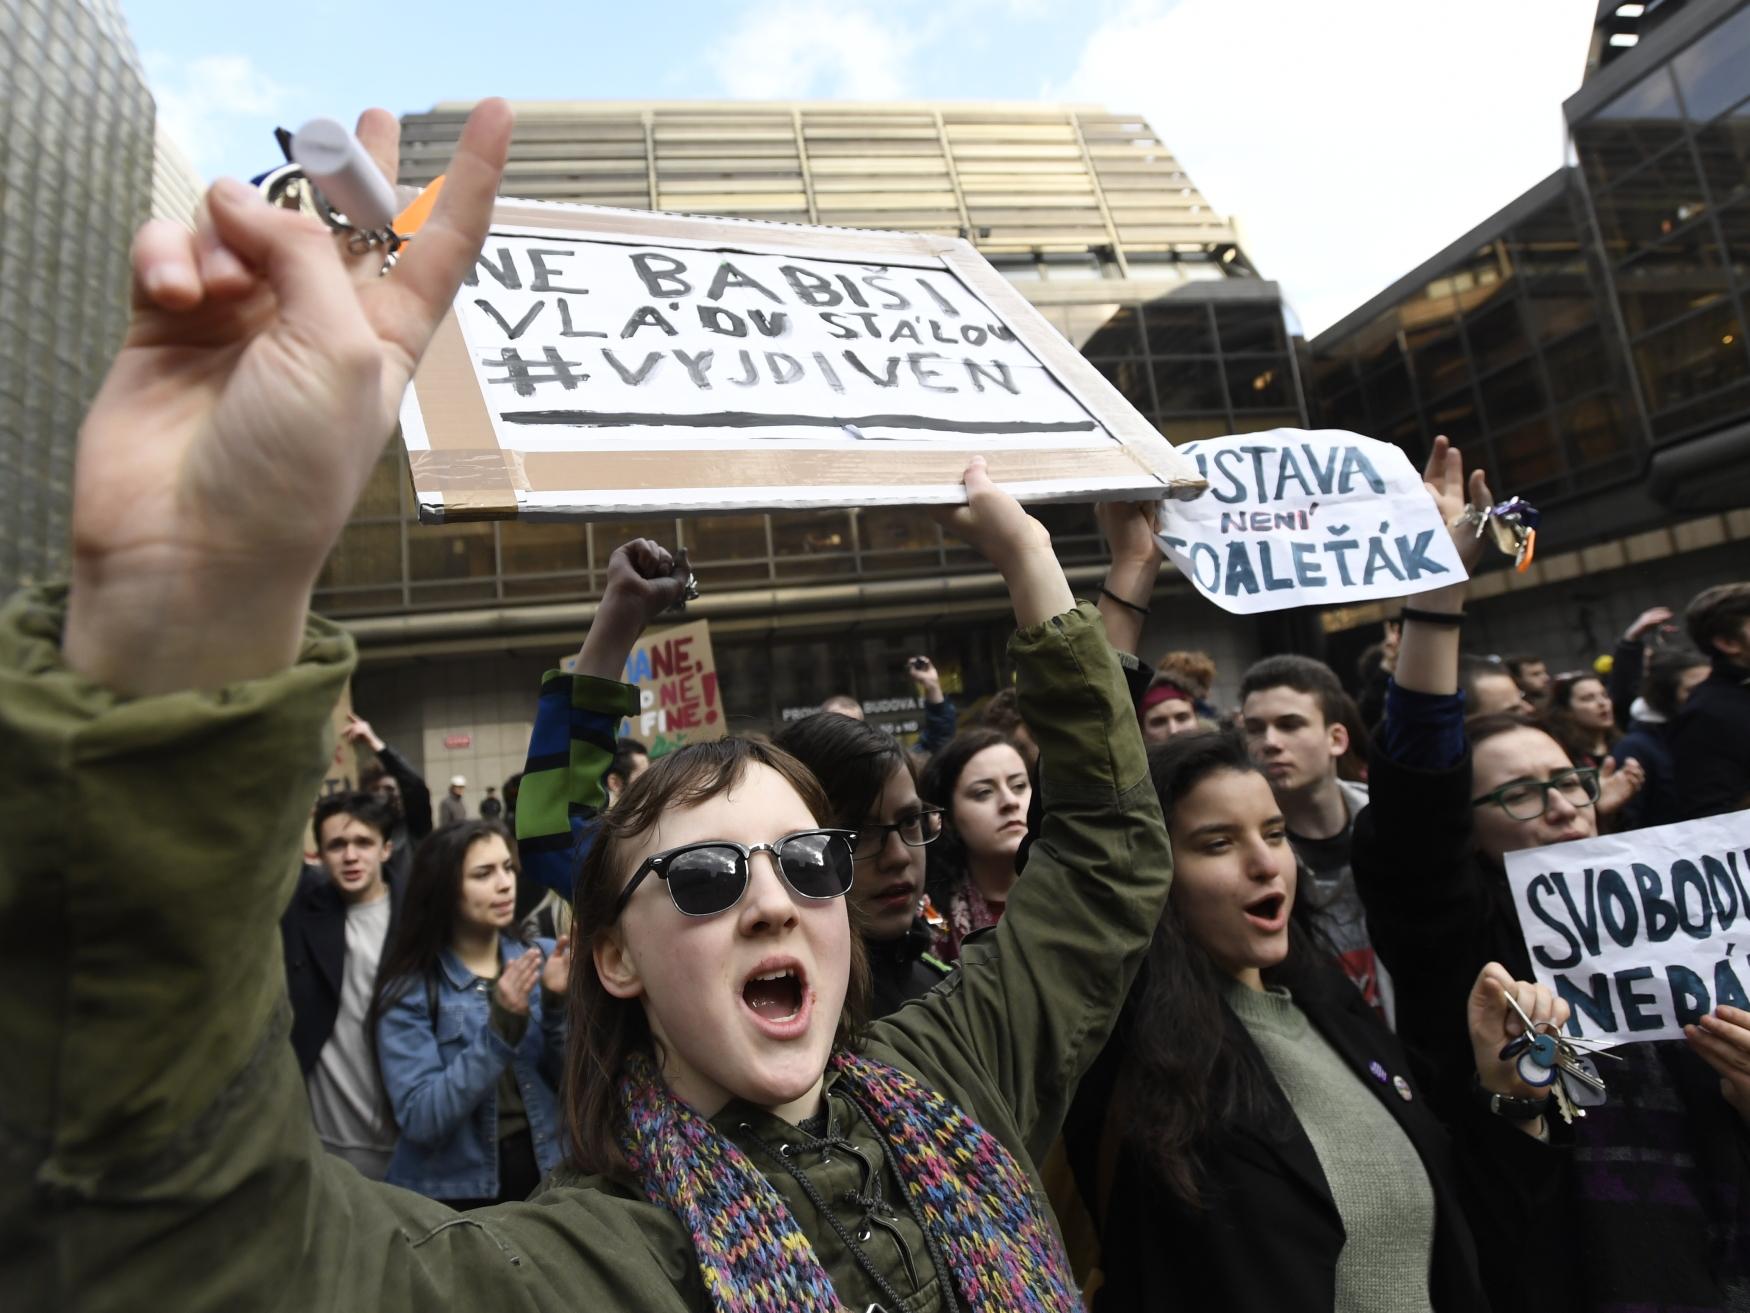 Students' gathering at Václav Havel square, Prague, March 15, 2018, photo: CTK